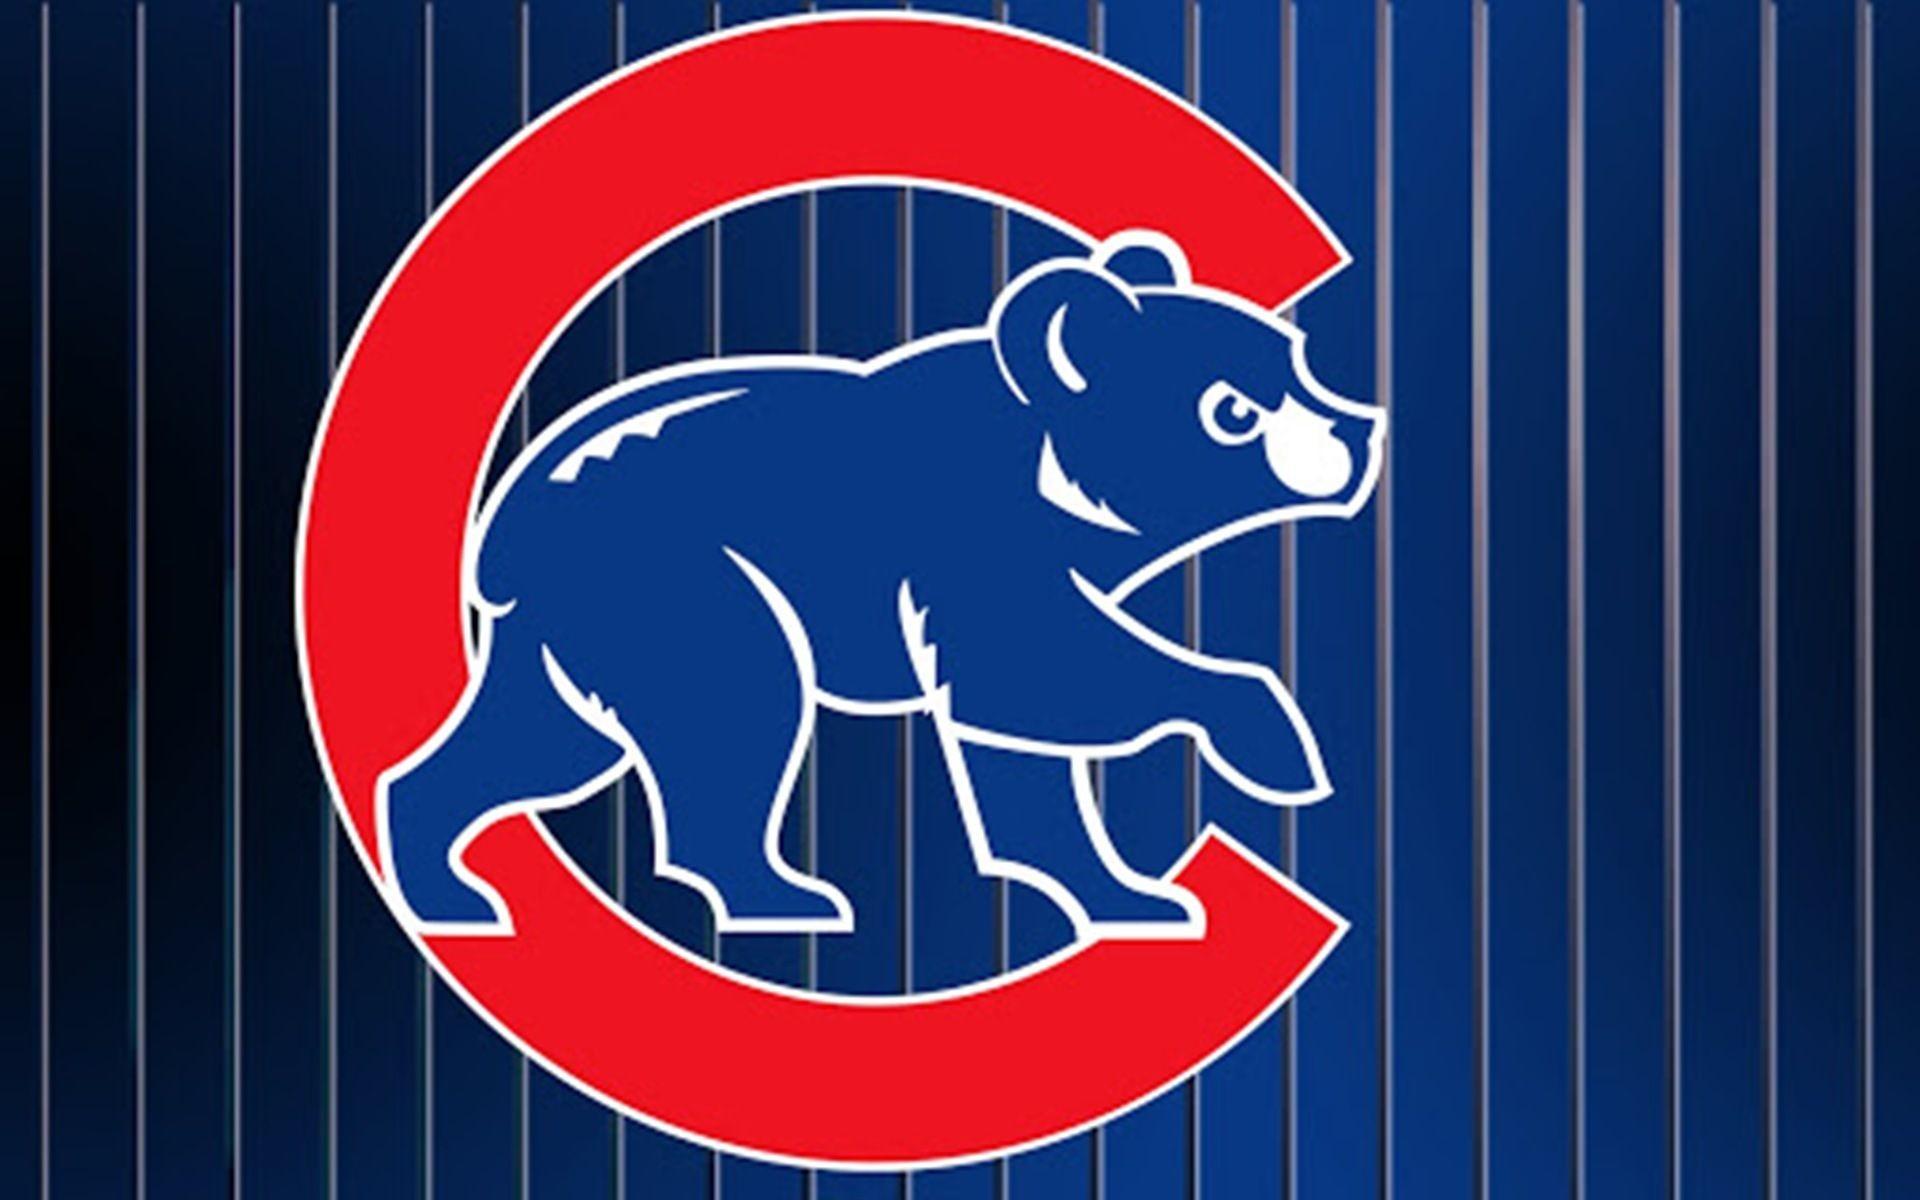 Chicago Cubs HD Wallpaper